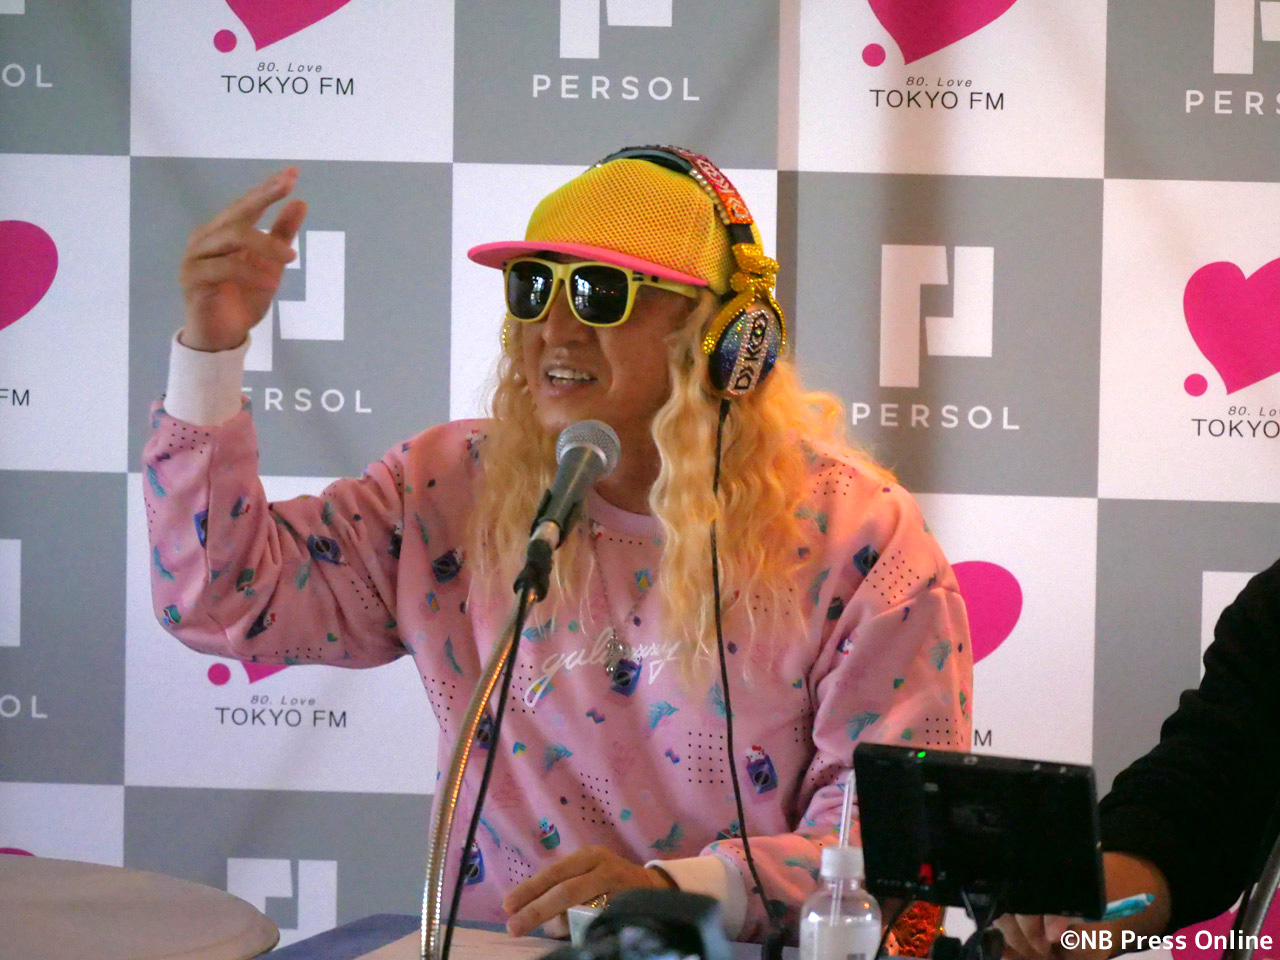 DJ Koo - パーソル presents 勤労感謝Fes!